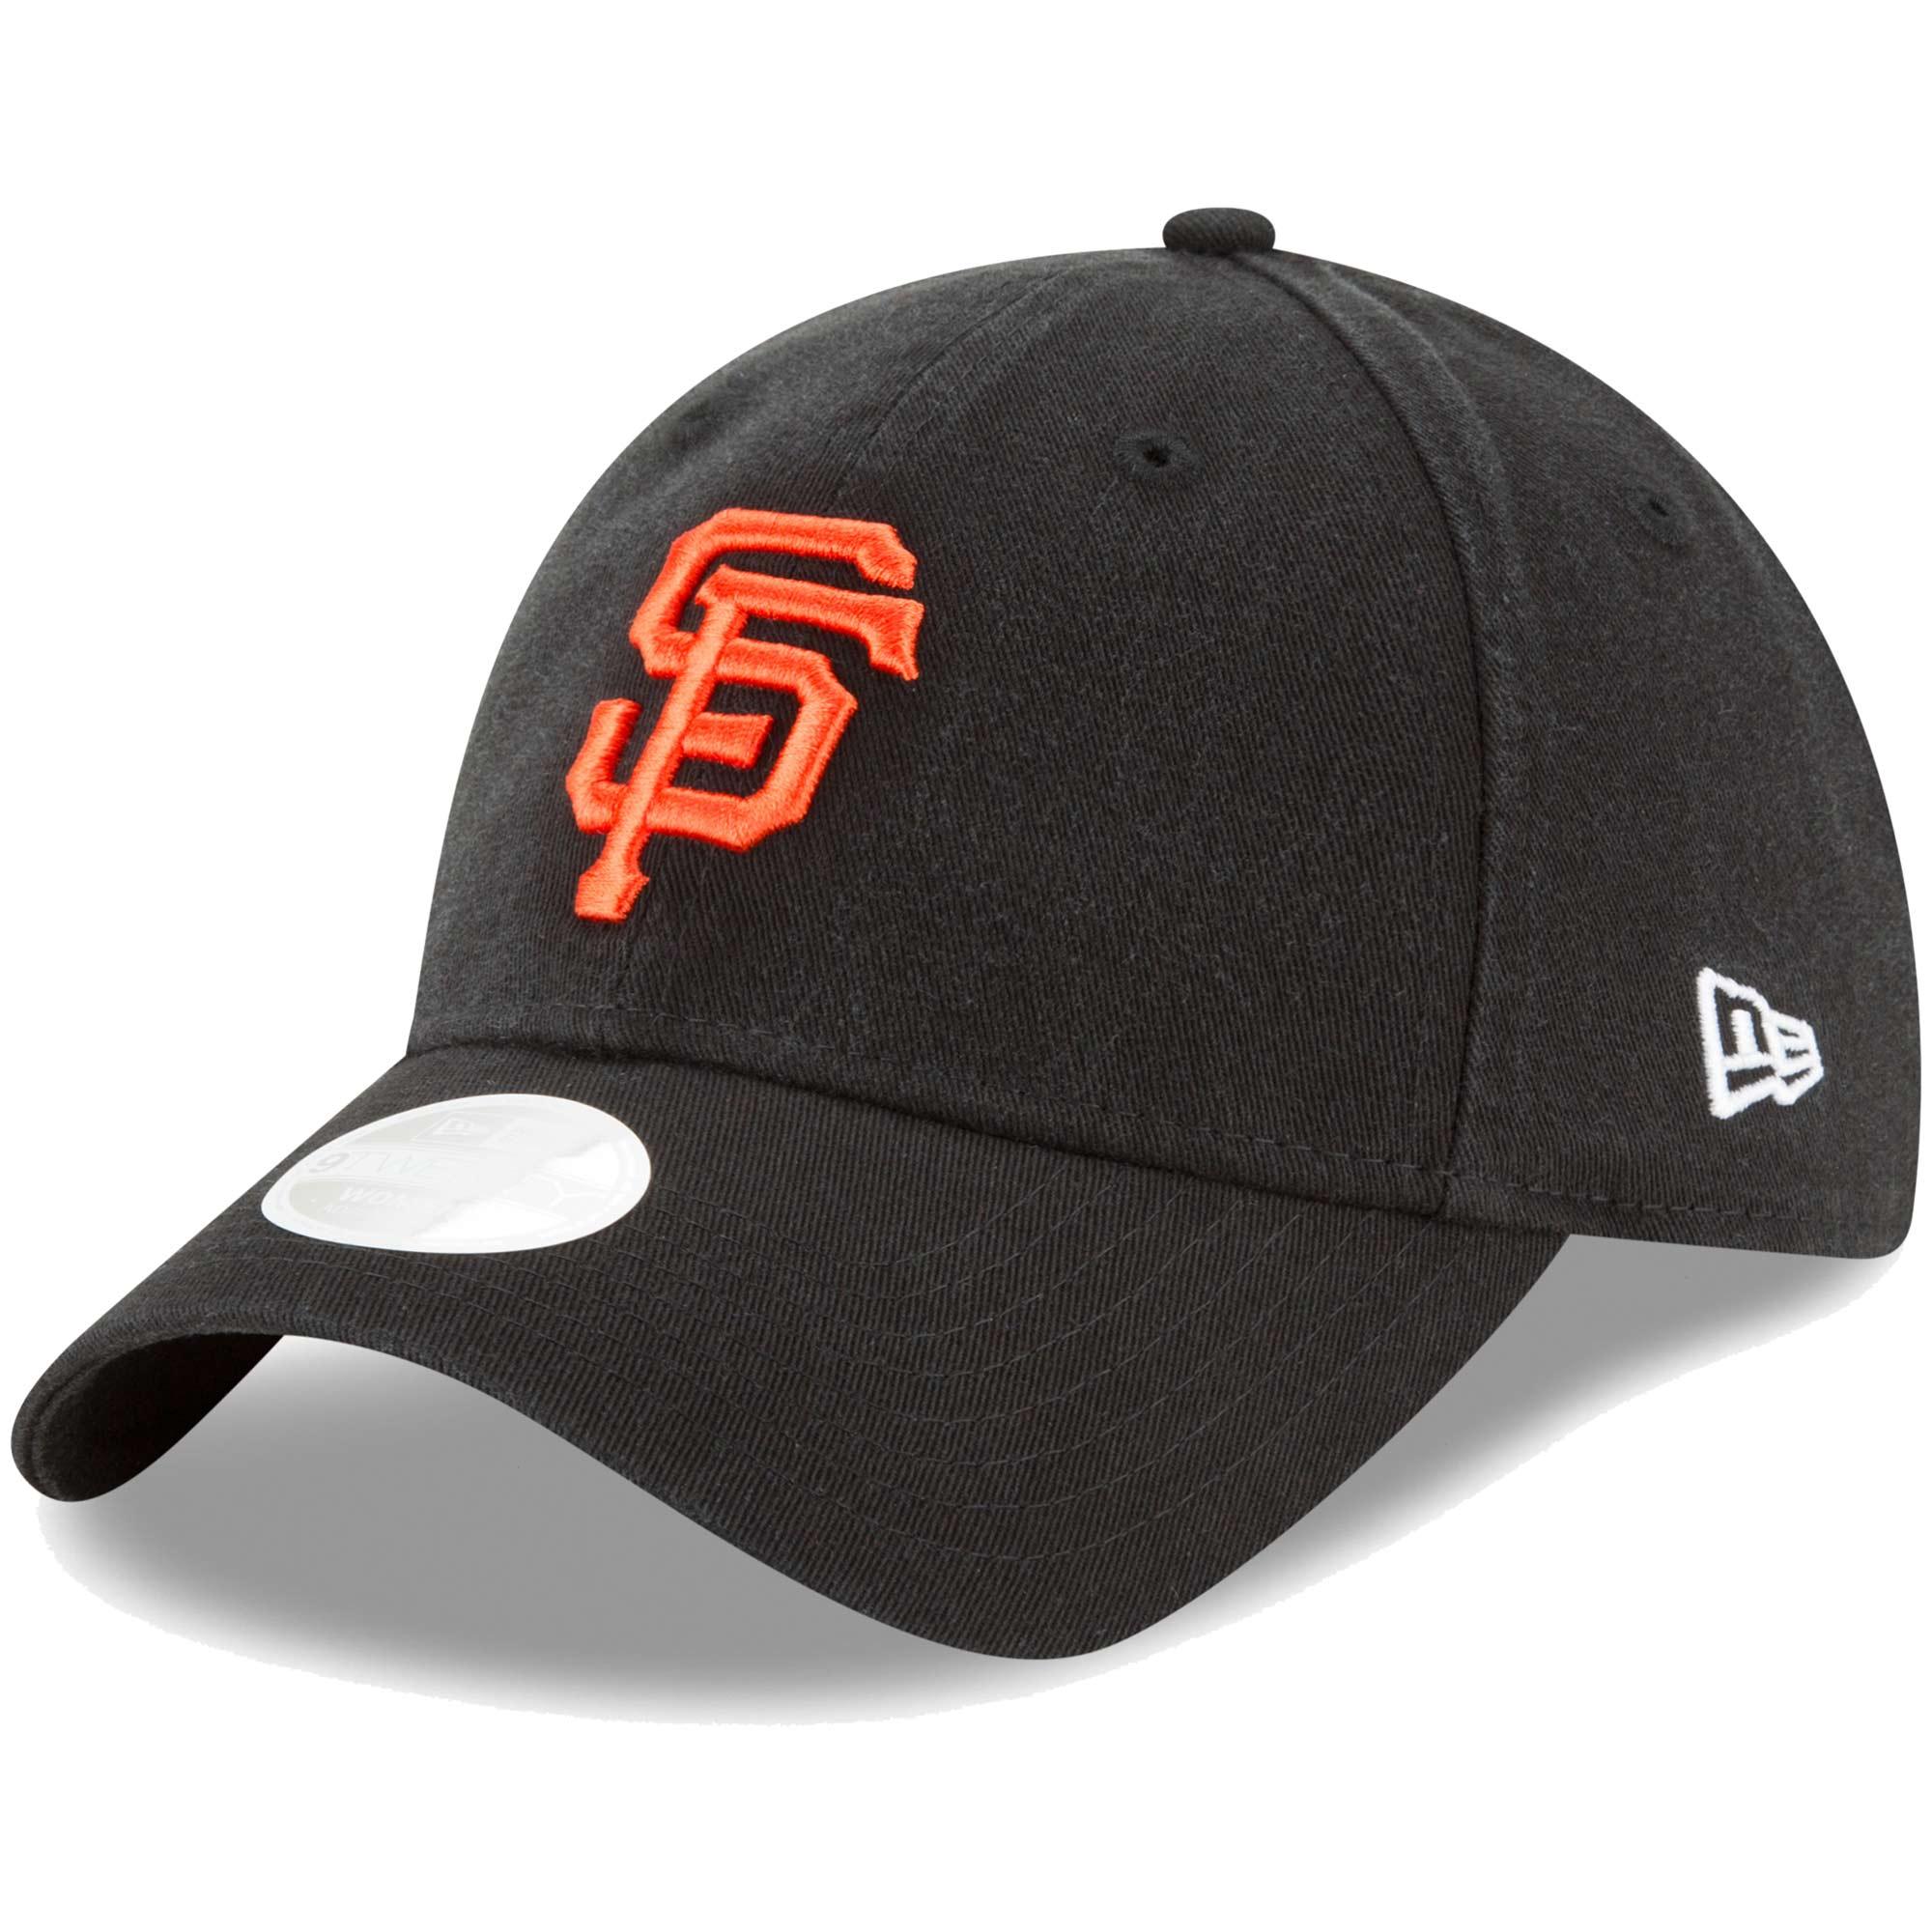 San Francisco Giants New Era Women's Core Classic Twill Team Color 9TWENTY Adjustable Hat - Black - OSFA